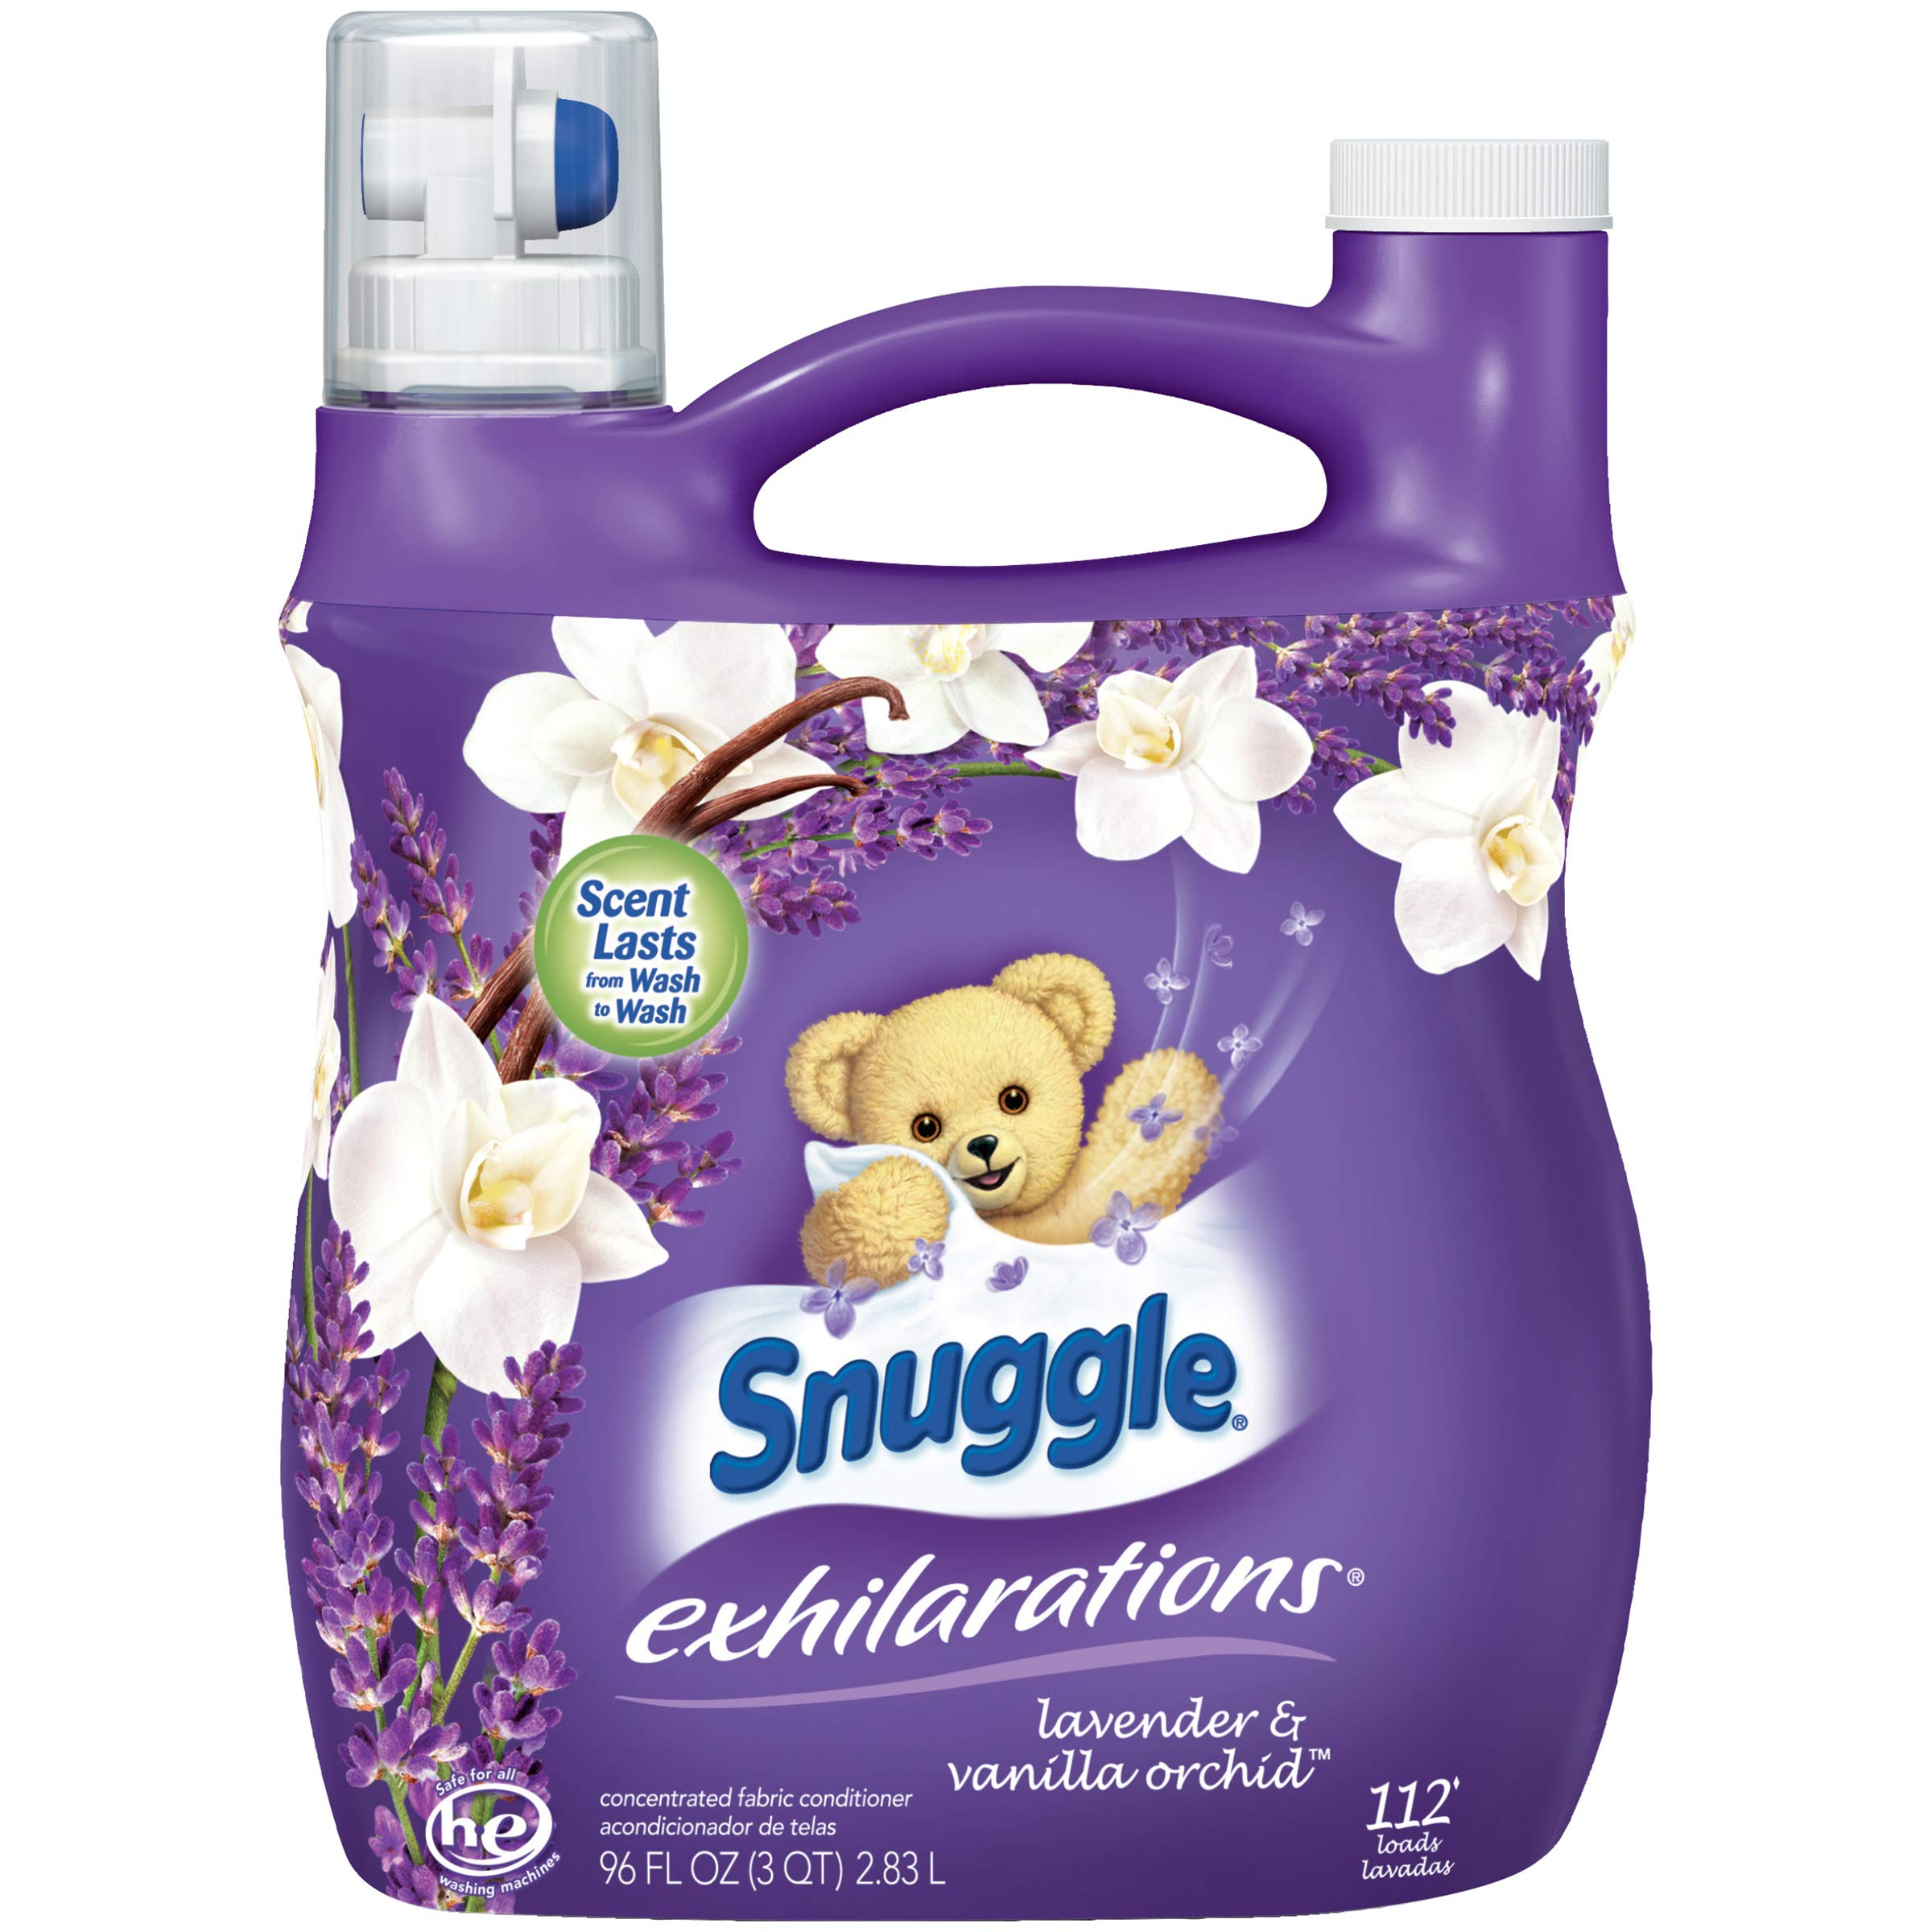 Snuggle Exhilarations Liquid Fabric Softener, White Lavender & Sandalwood Twist, ...